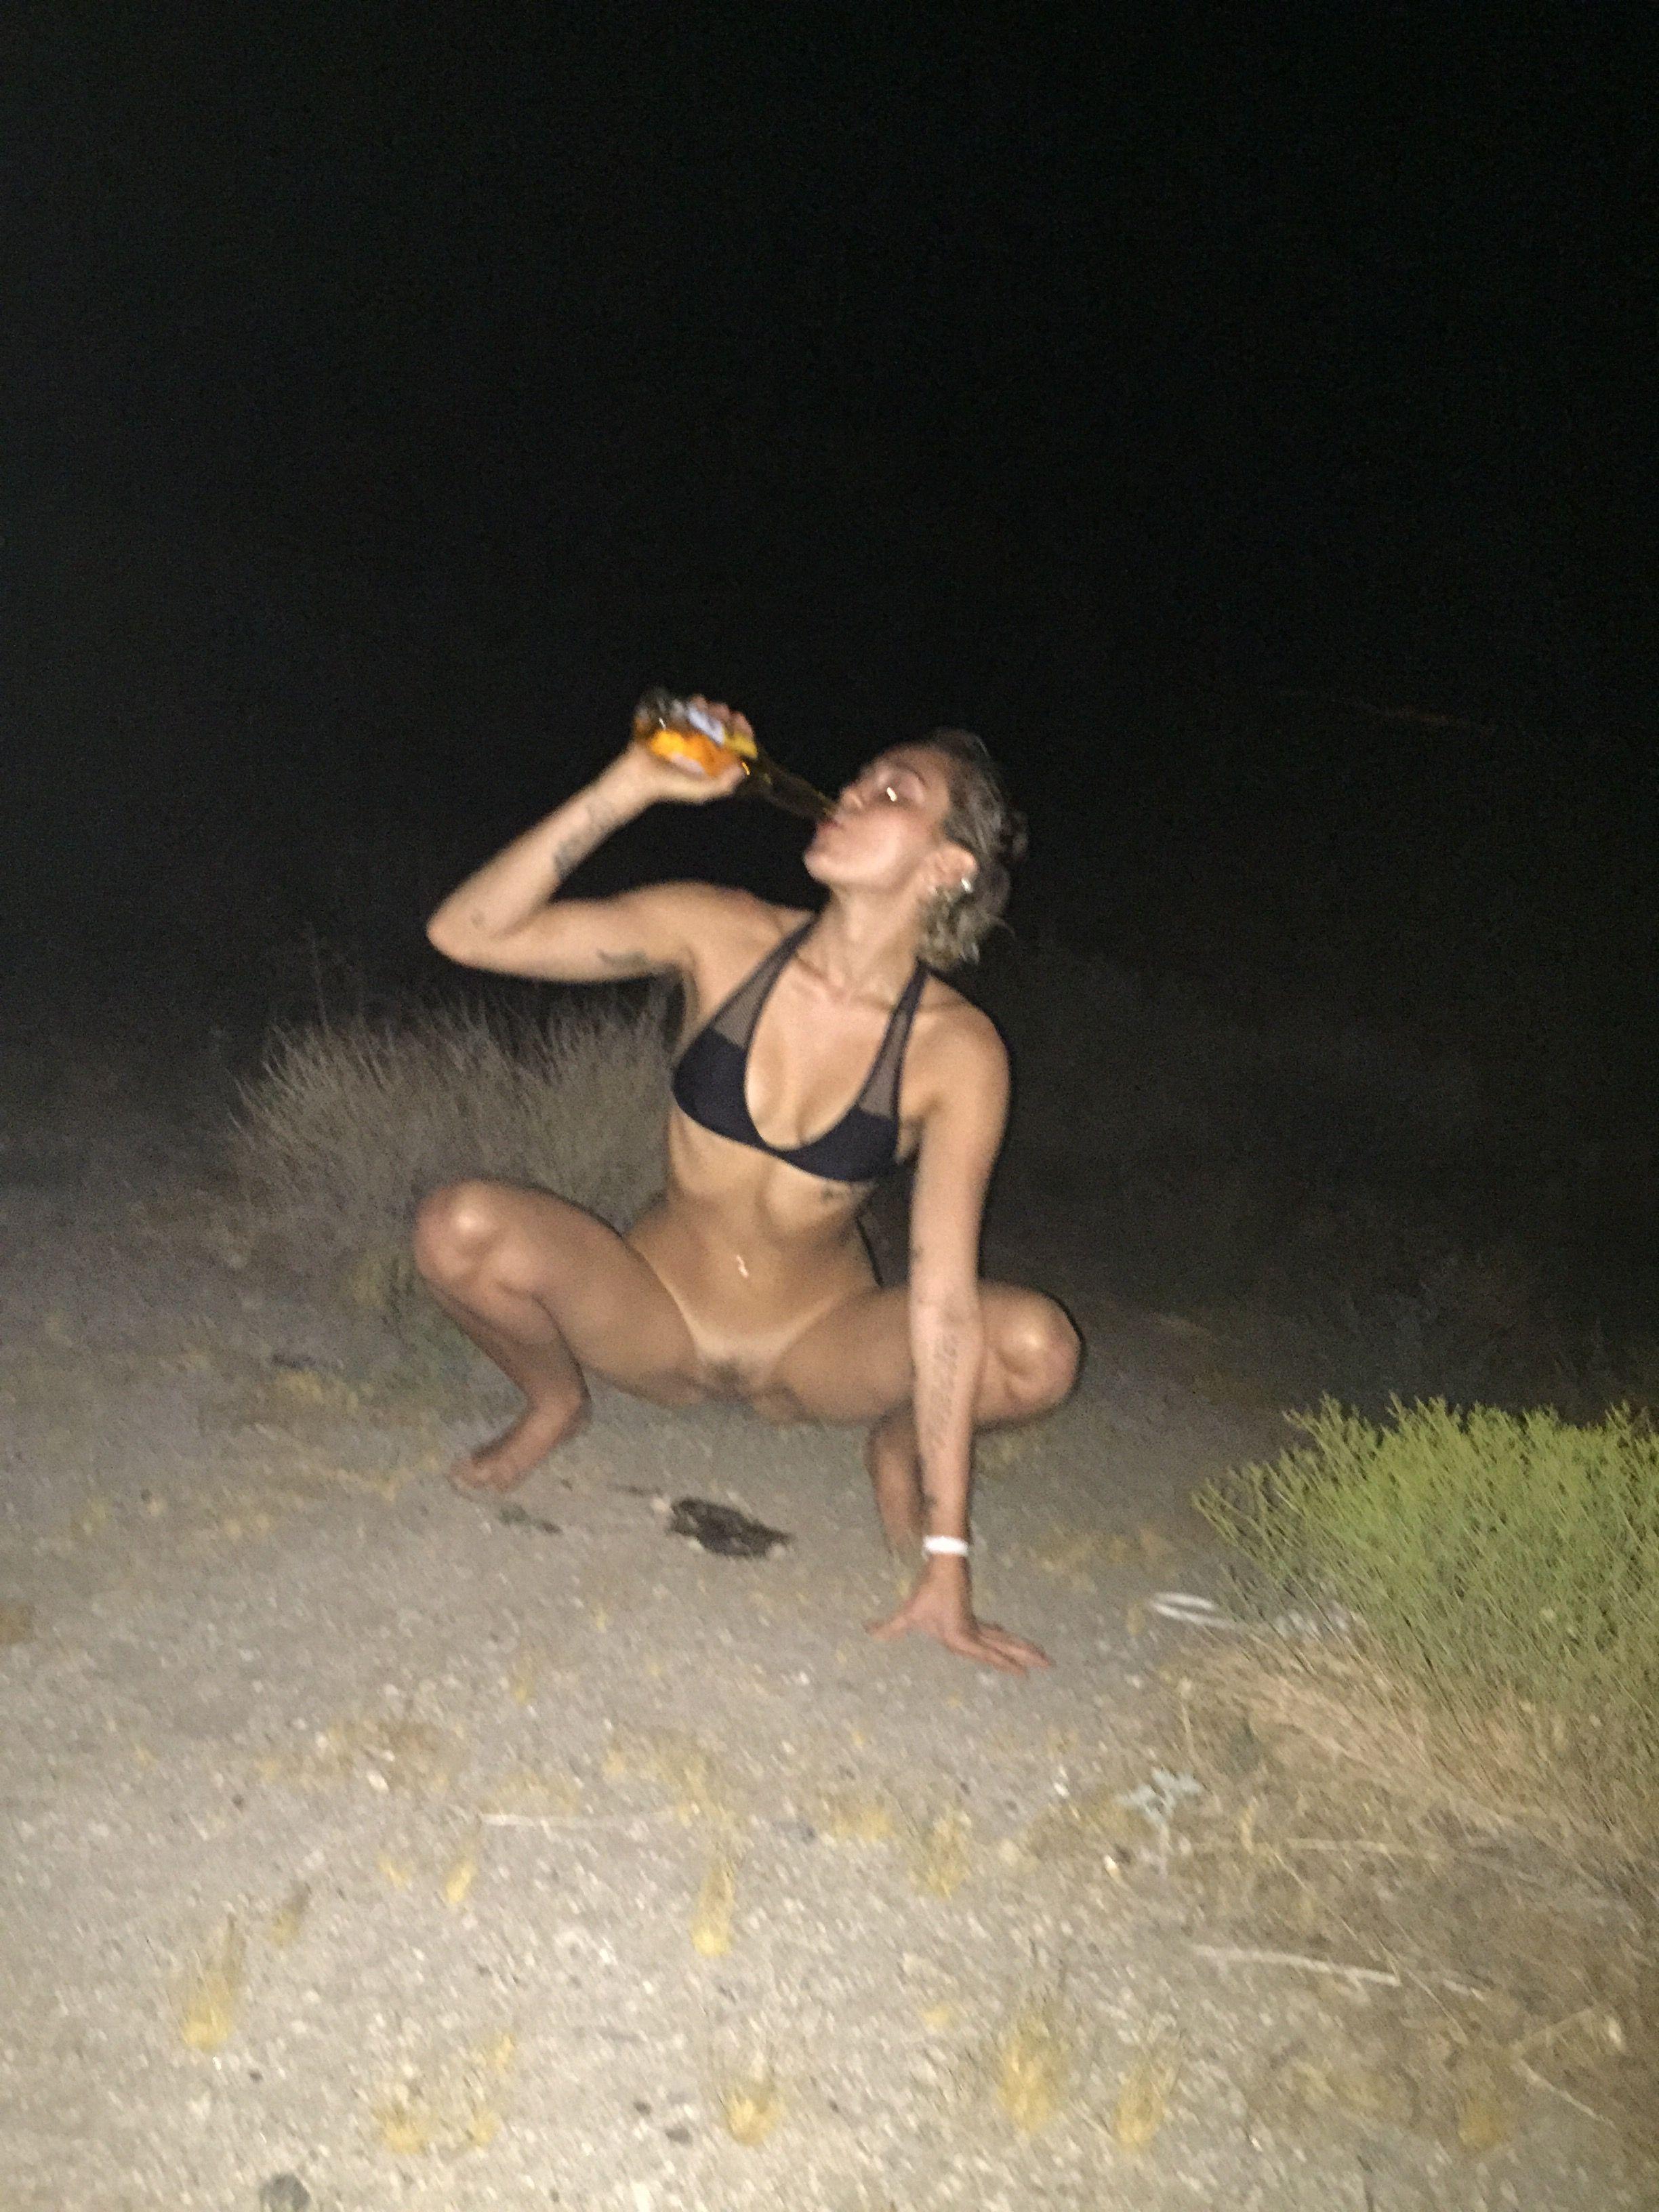 mp4 video Porn tube piss lesbian